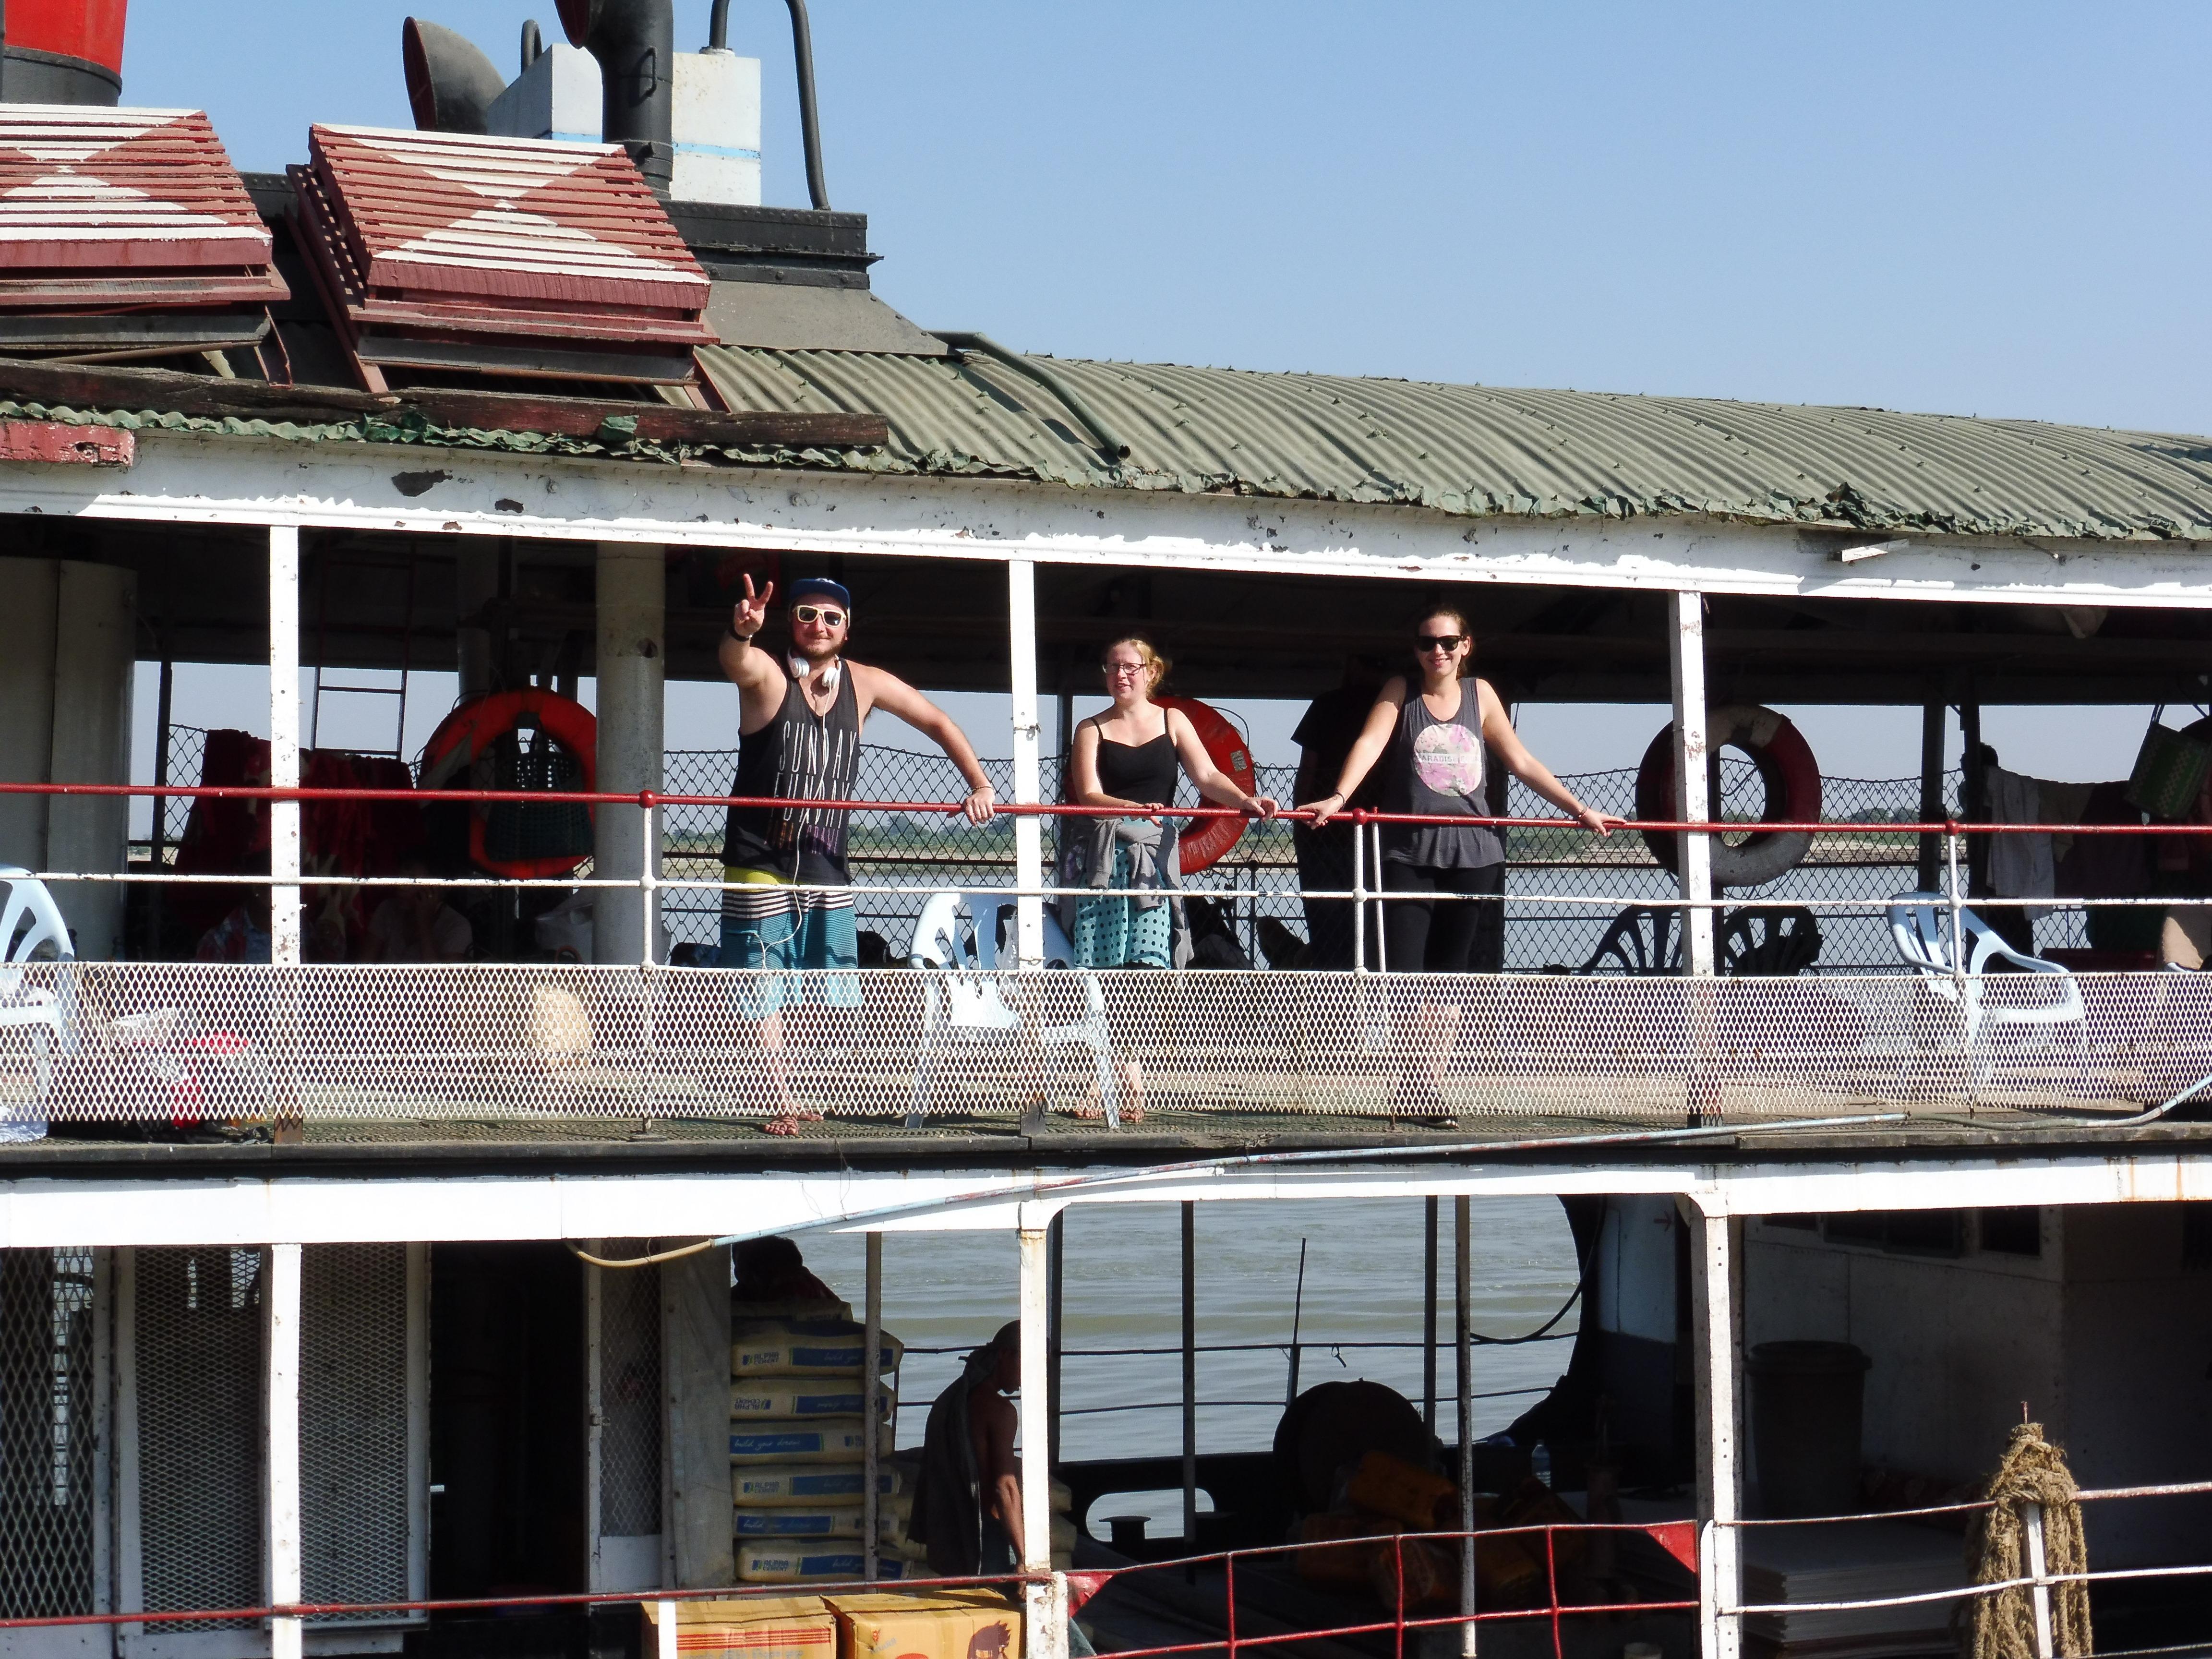 Boat Irrawady